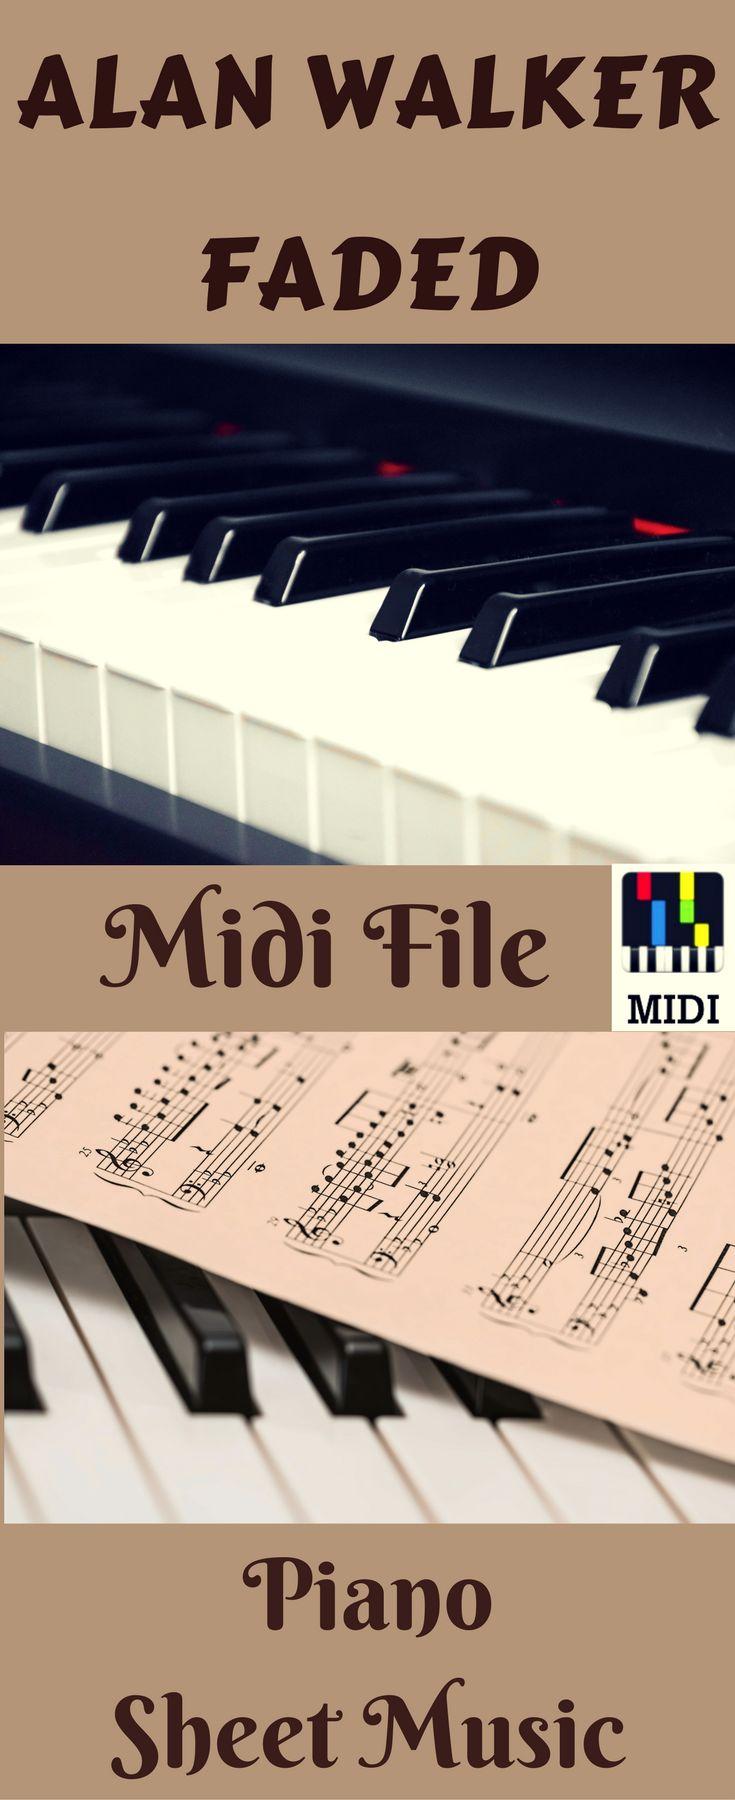 Alan Walker Faded Midi File. Alan Walker Faded Piano Tutorial & Sheet Music. #alanwalker #faded #midifile #sheetmusic #pianotutorial #instrumental